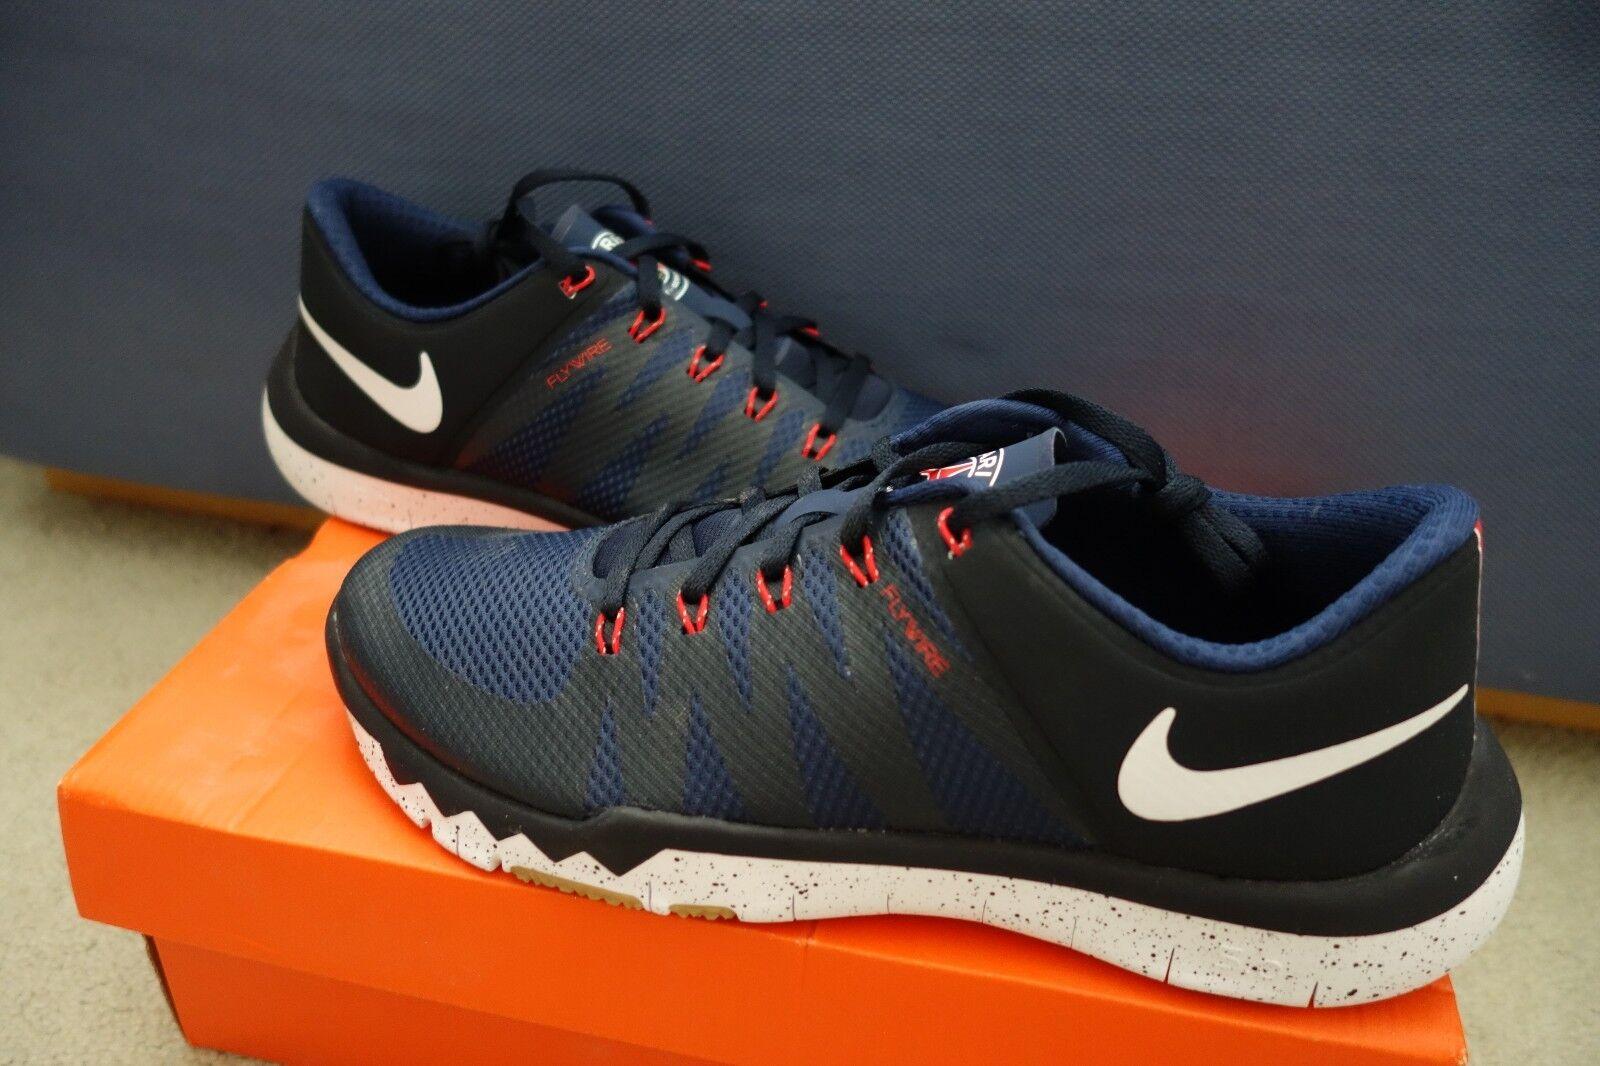 Nike Free Trainer 5.0 5.0 5.0 V6 AMP Paris Saint-Germain PSG size 9.5 723939-411 80579e